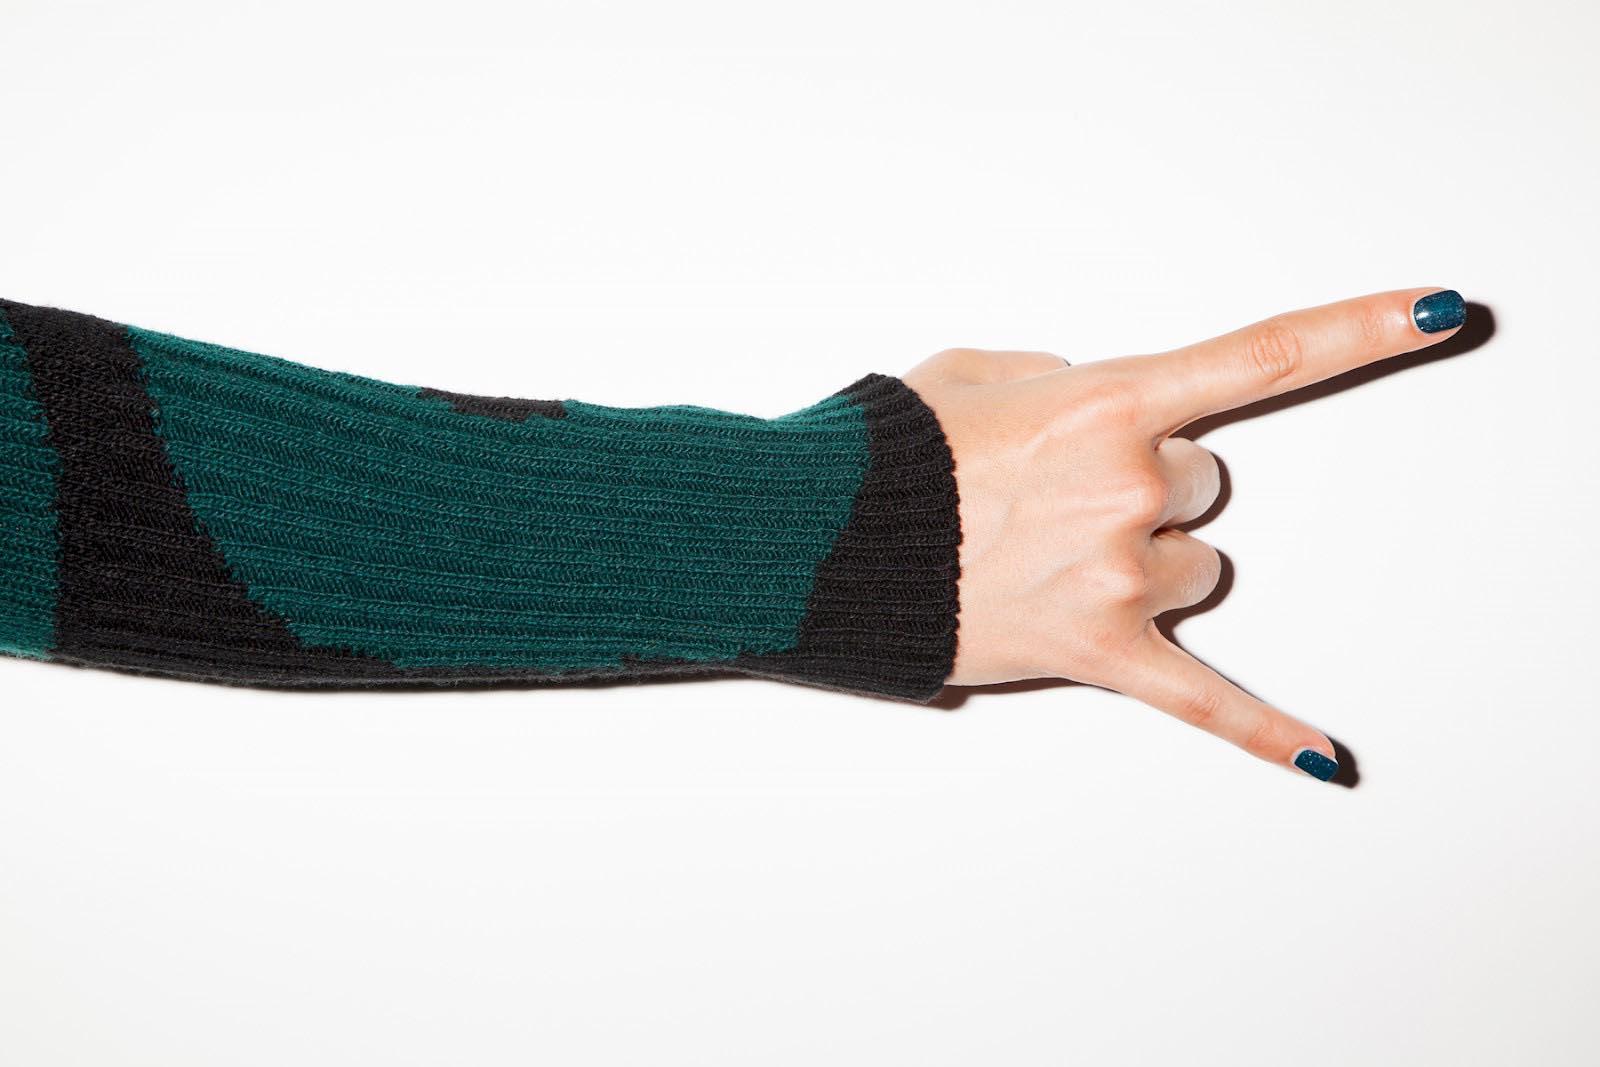 hand body bodypart finger fingers bodyparts